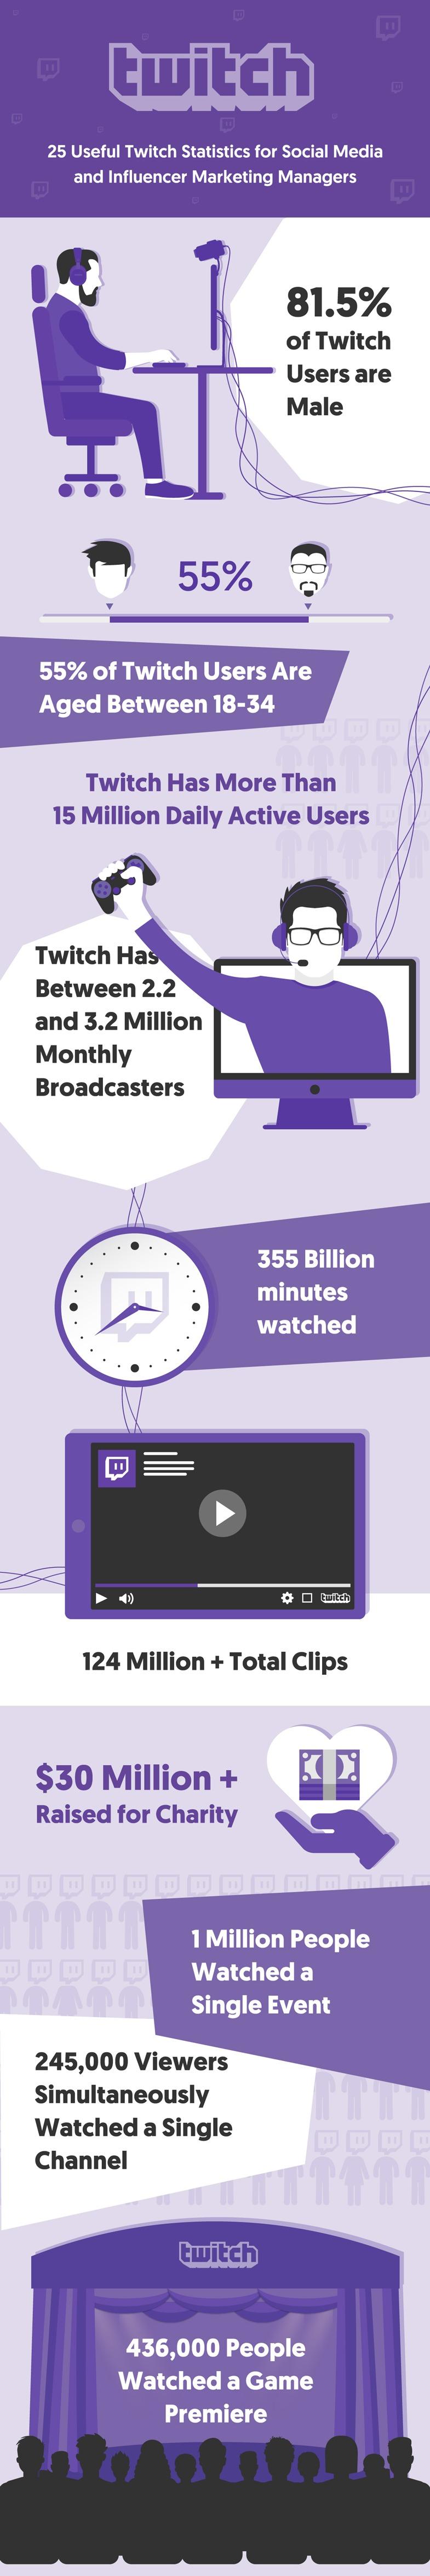 Twitch Infographic - Twitch Statistics